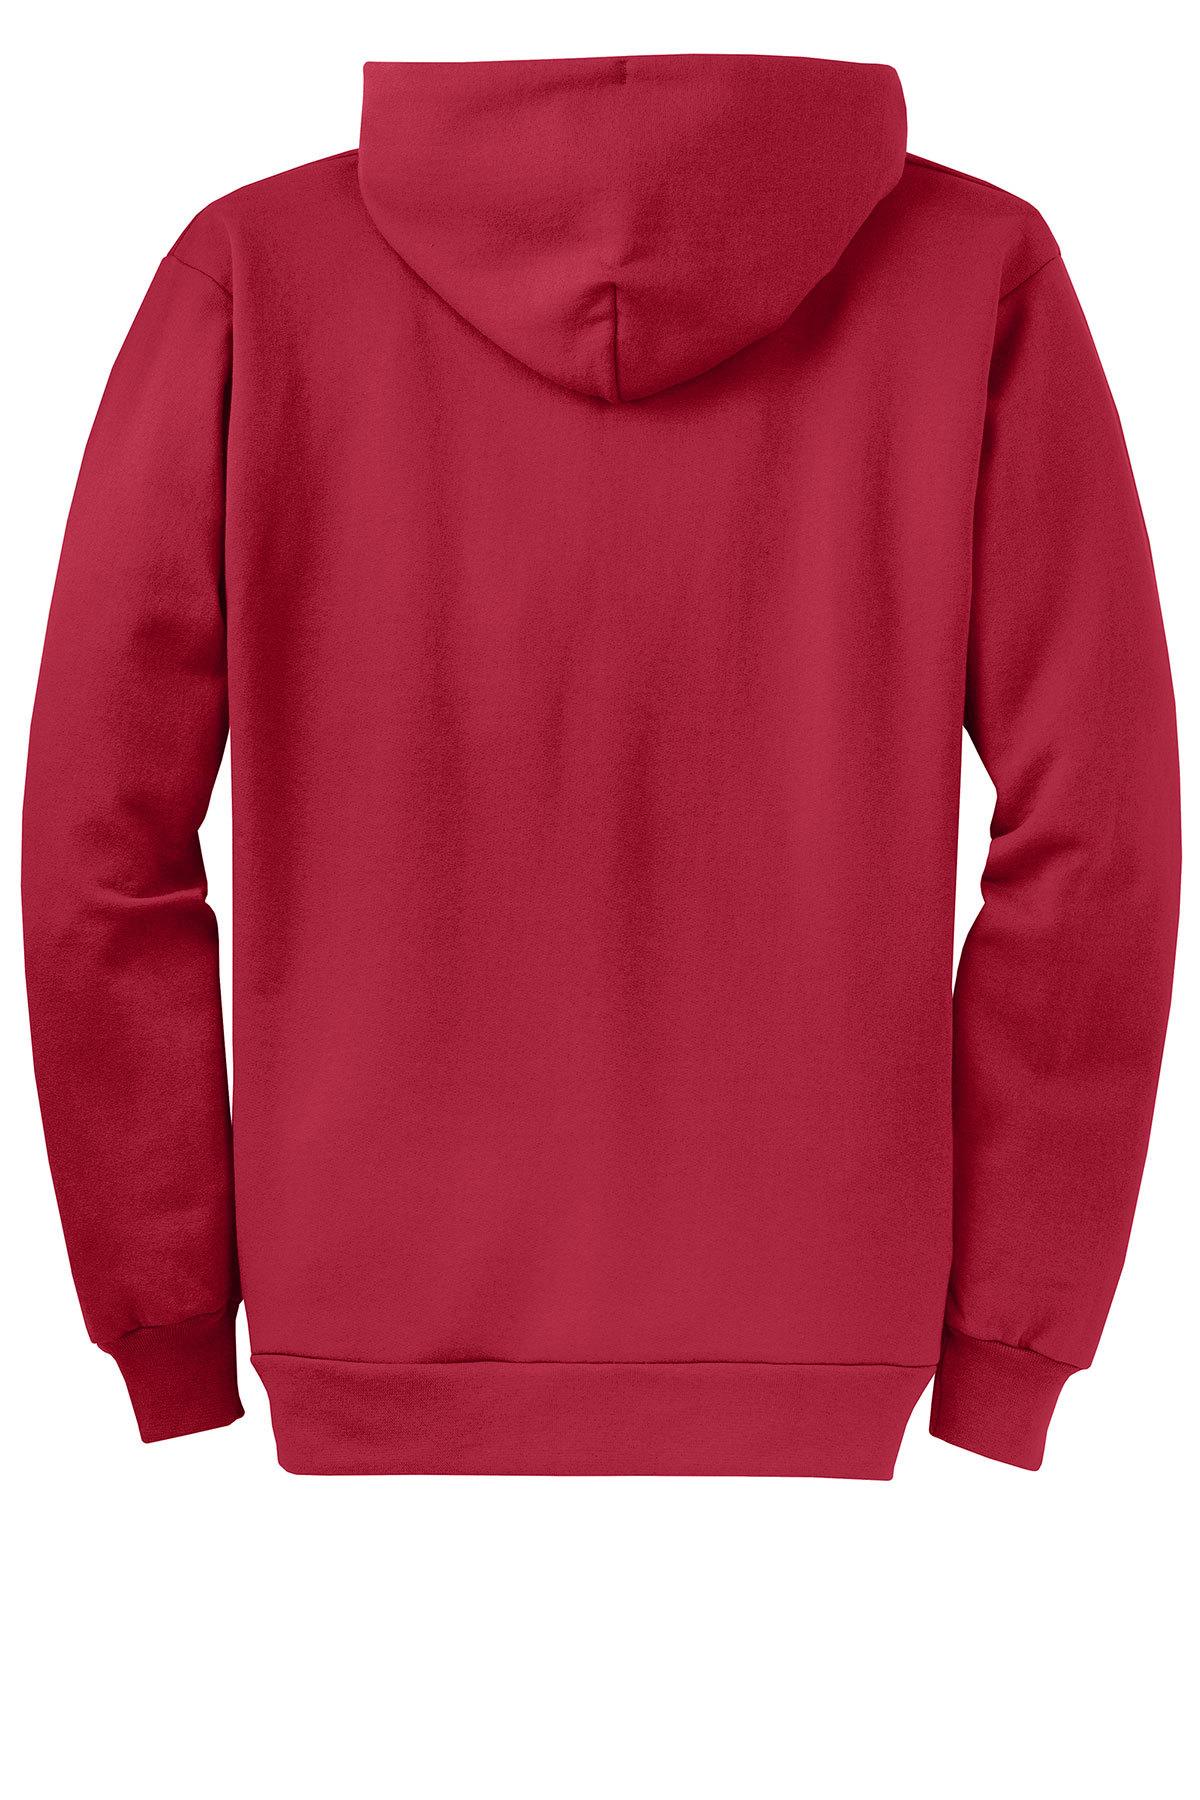 Port /& Company Mens Hooded Fleece Sweatshirt,X-Large,Dark Green